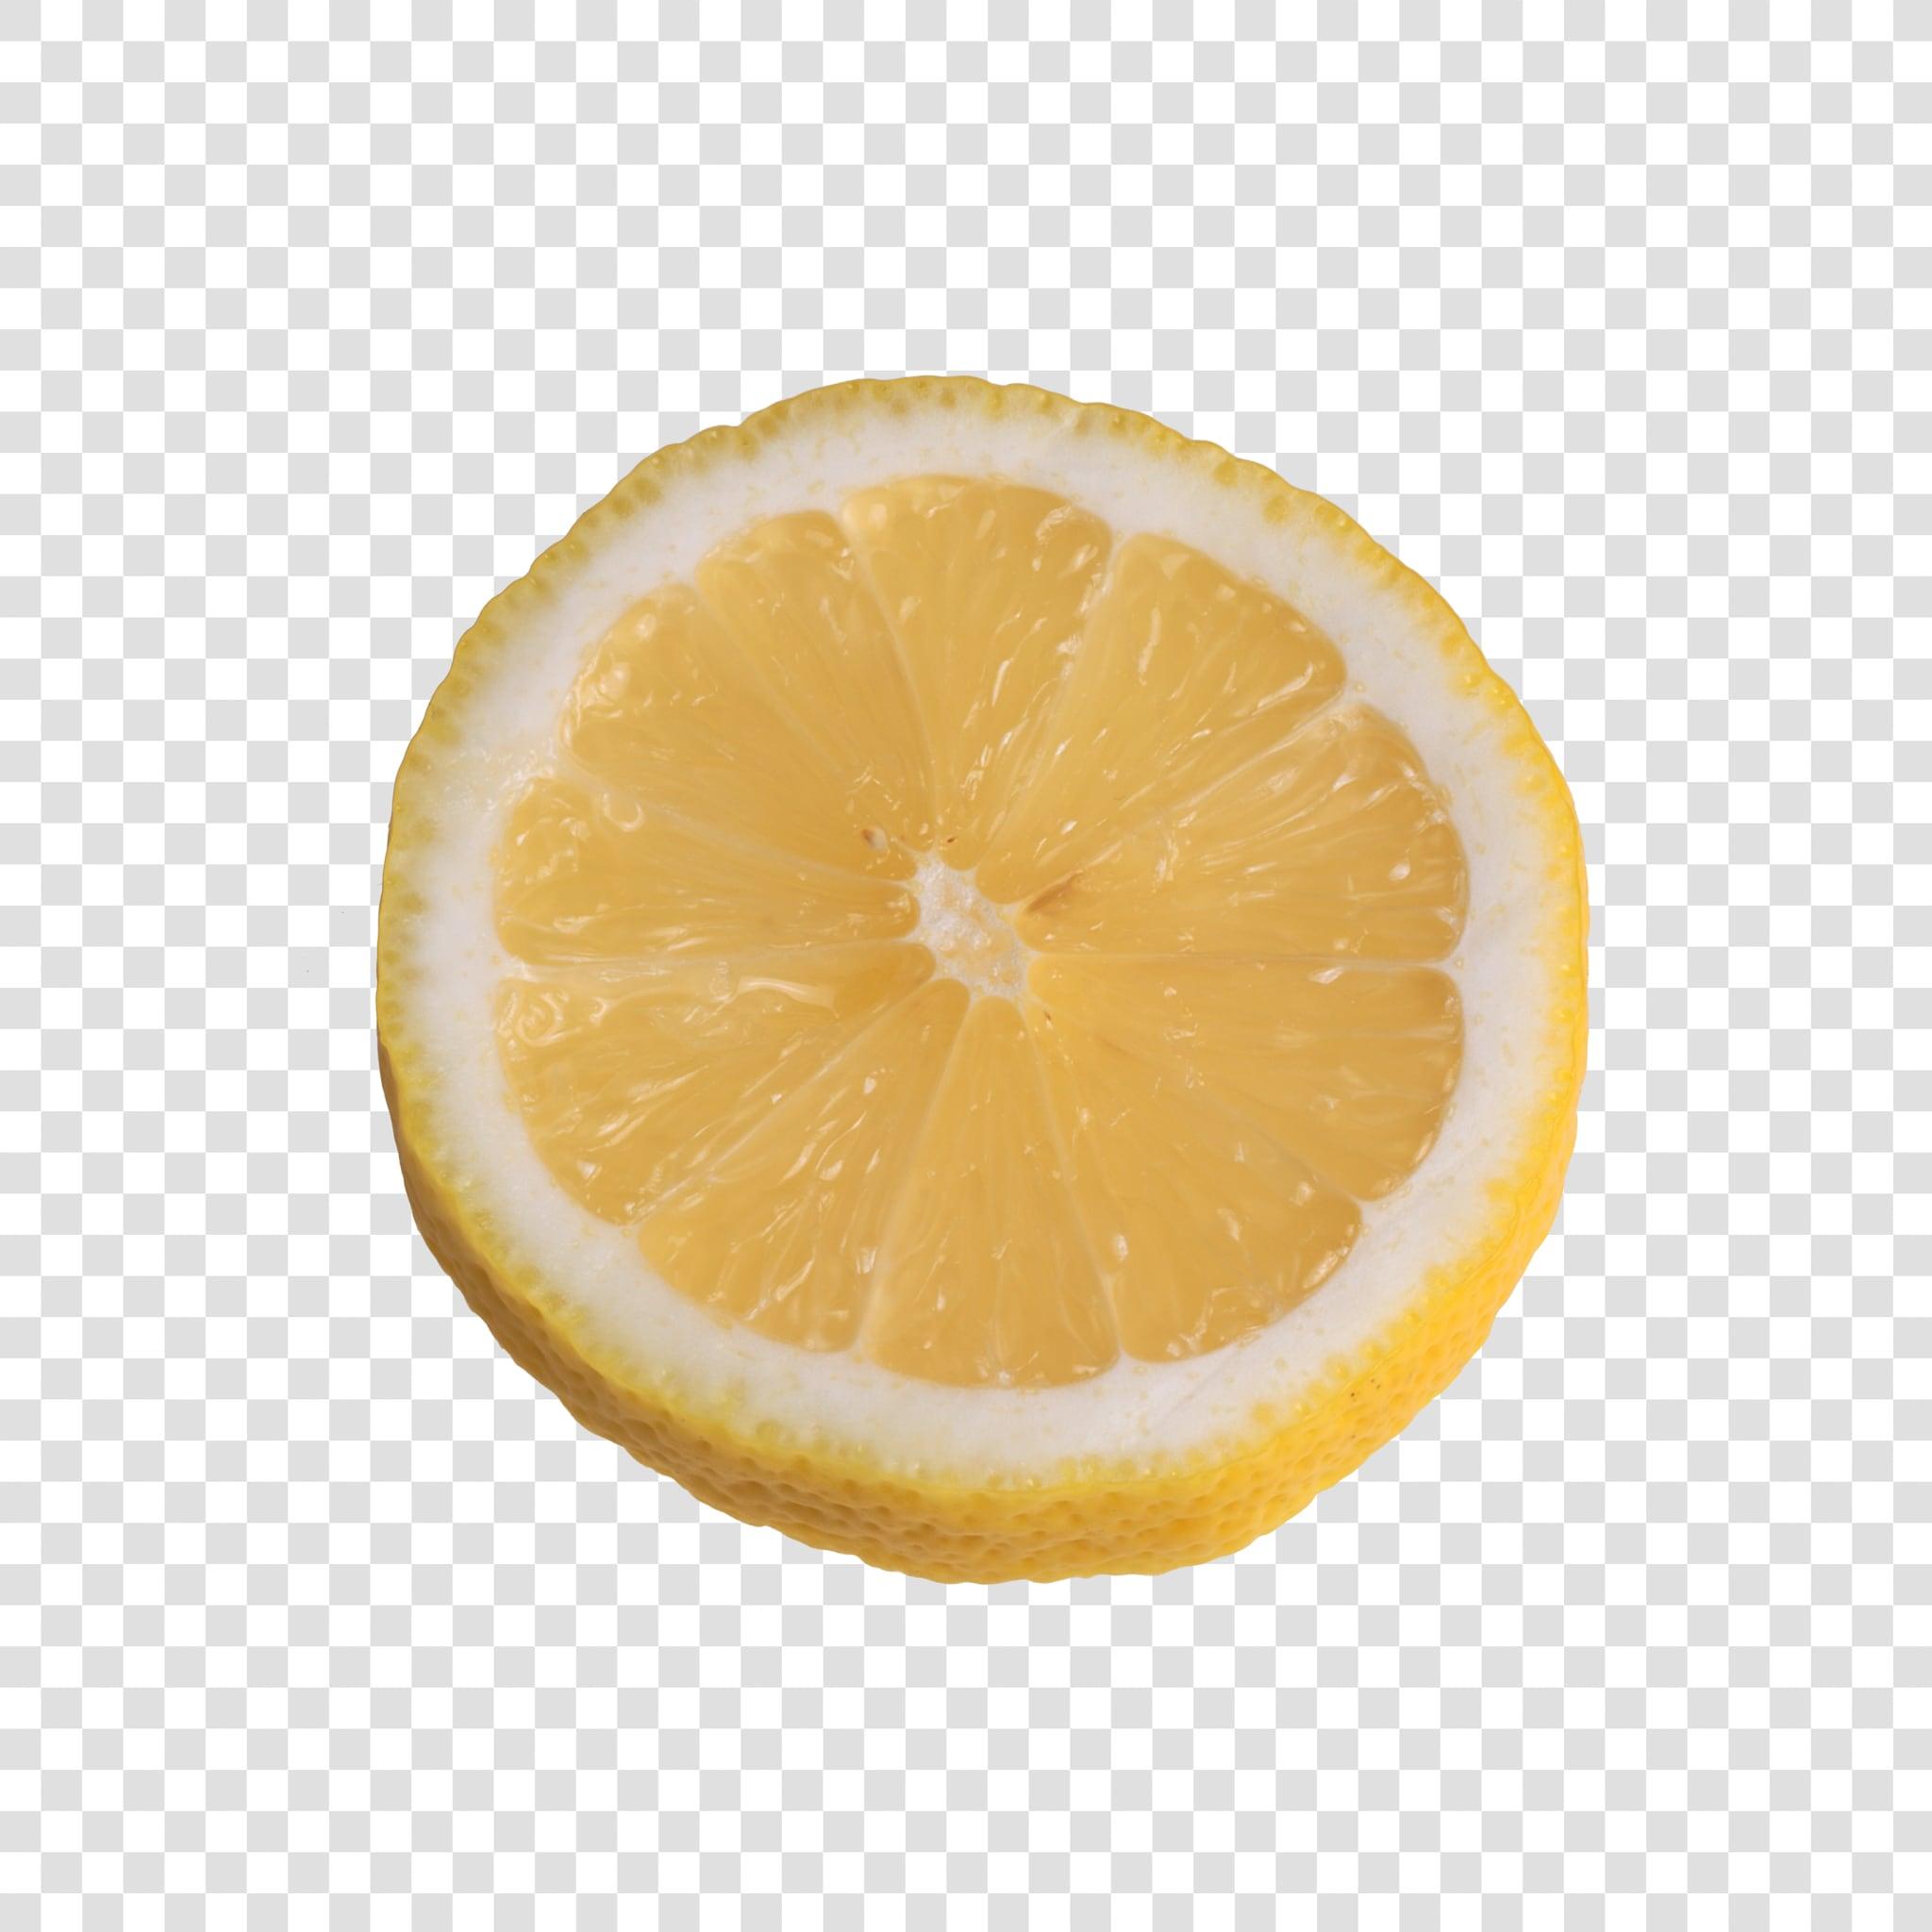 Lemon PSD image with transparent background